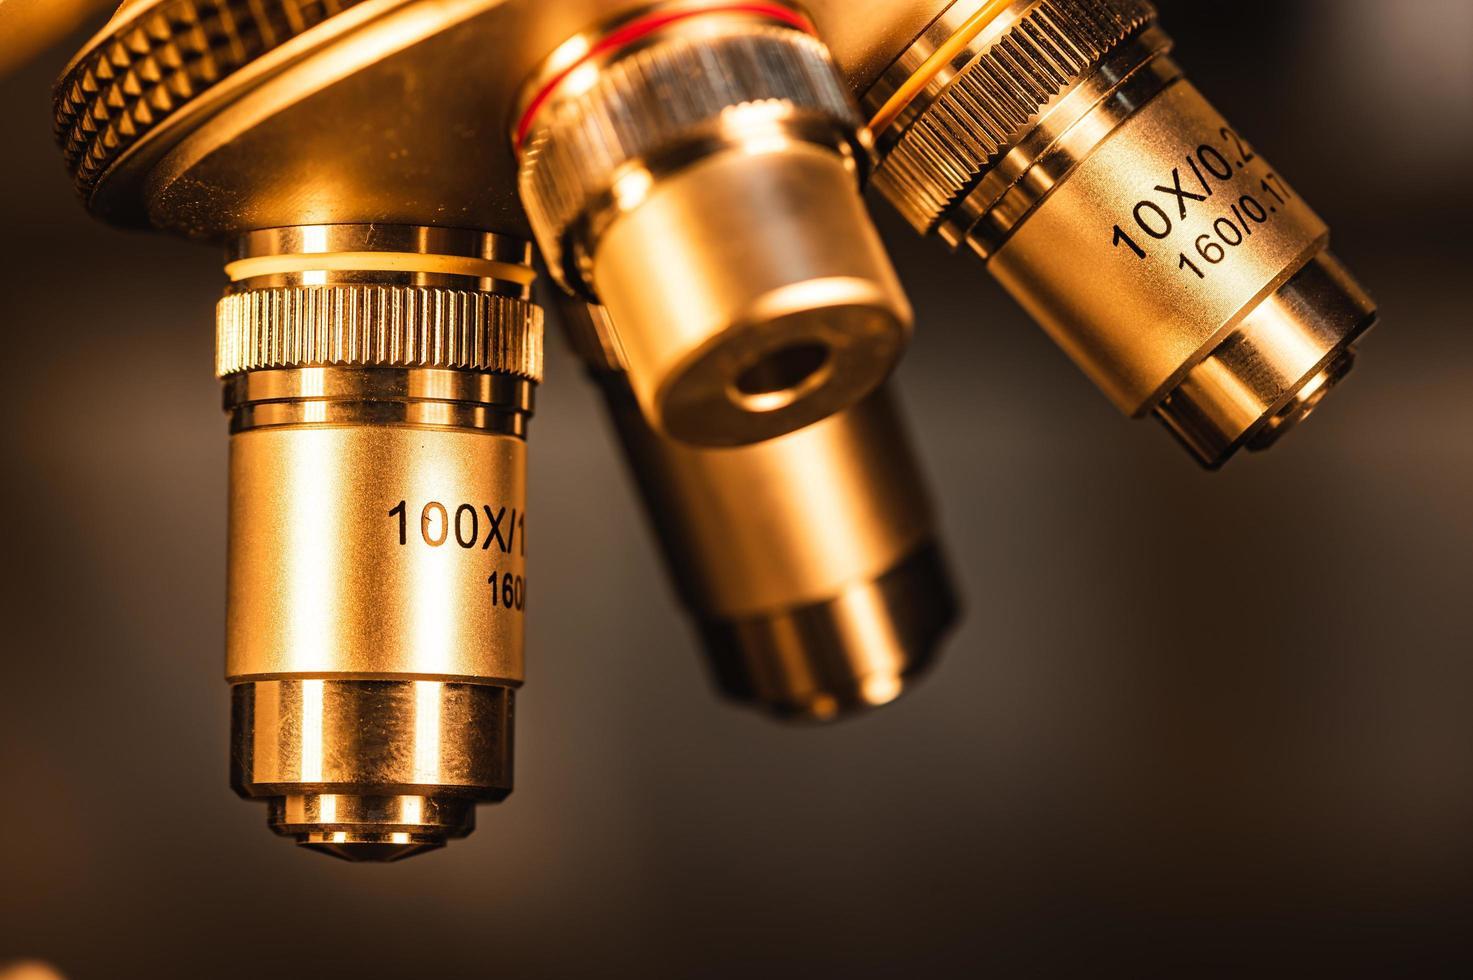 Nahaufnahme eines Metallmikroskops foto